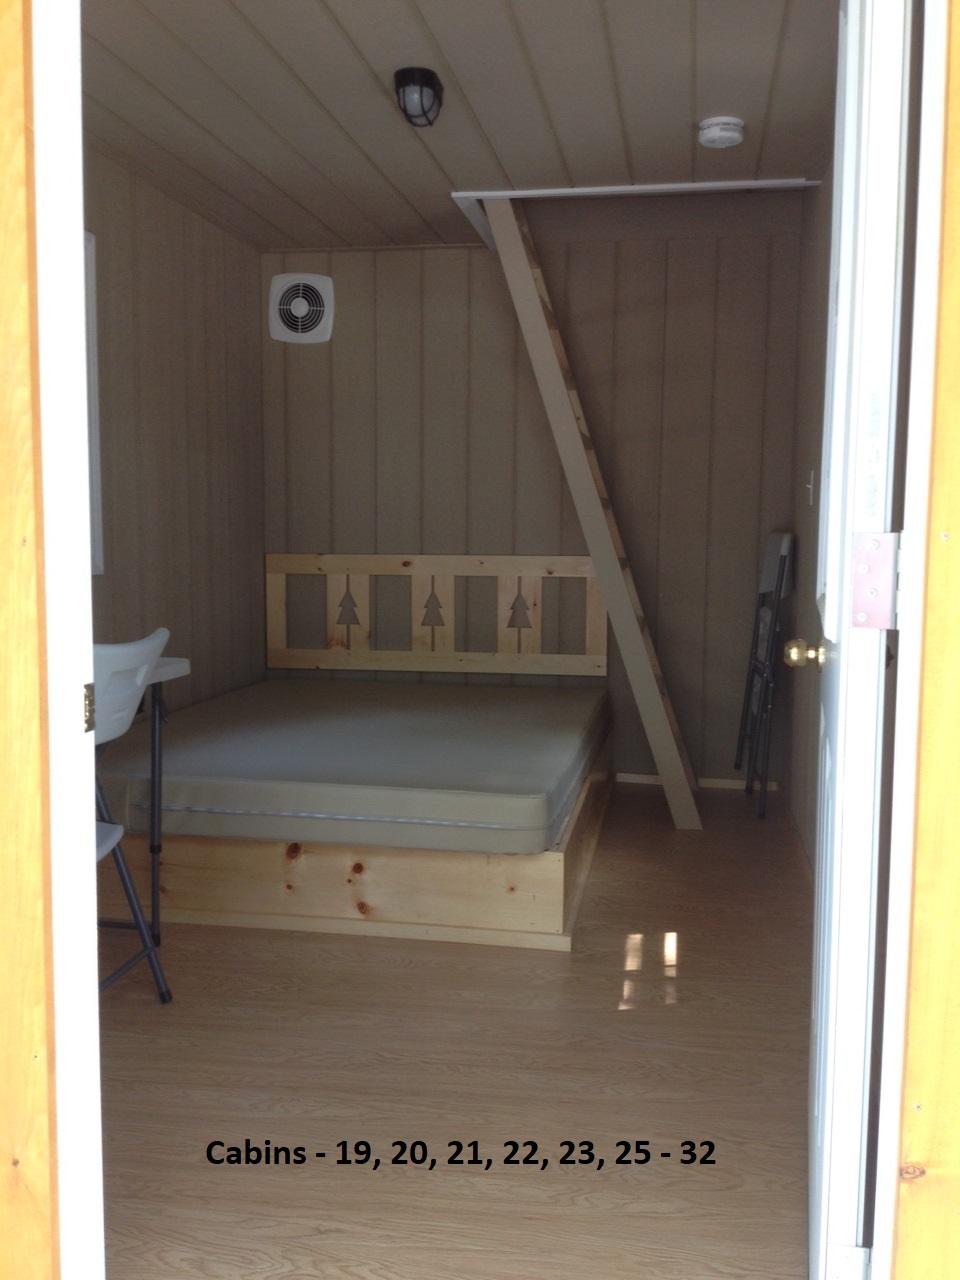 Loft Cabin - labelled